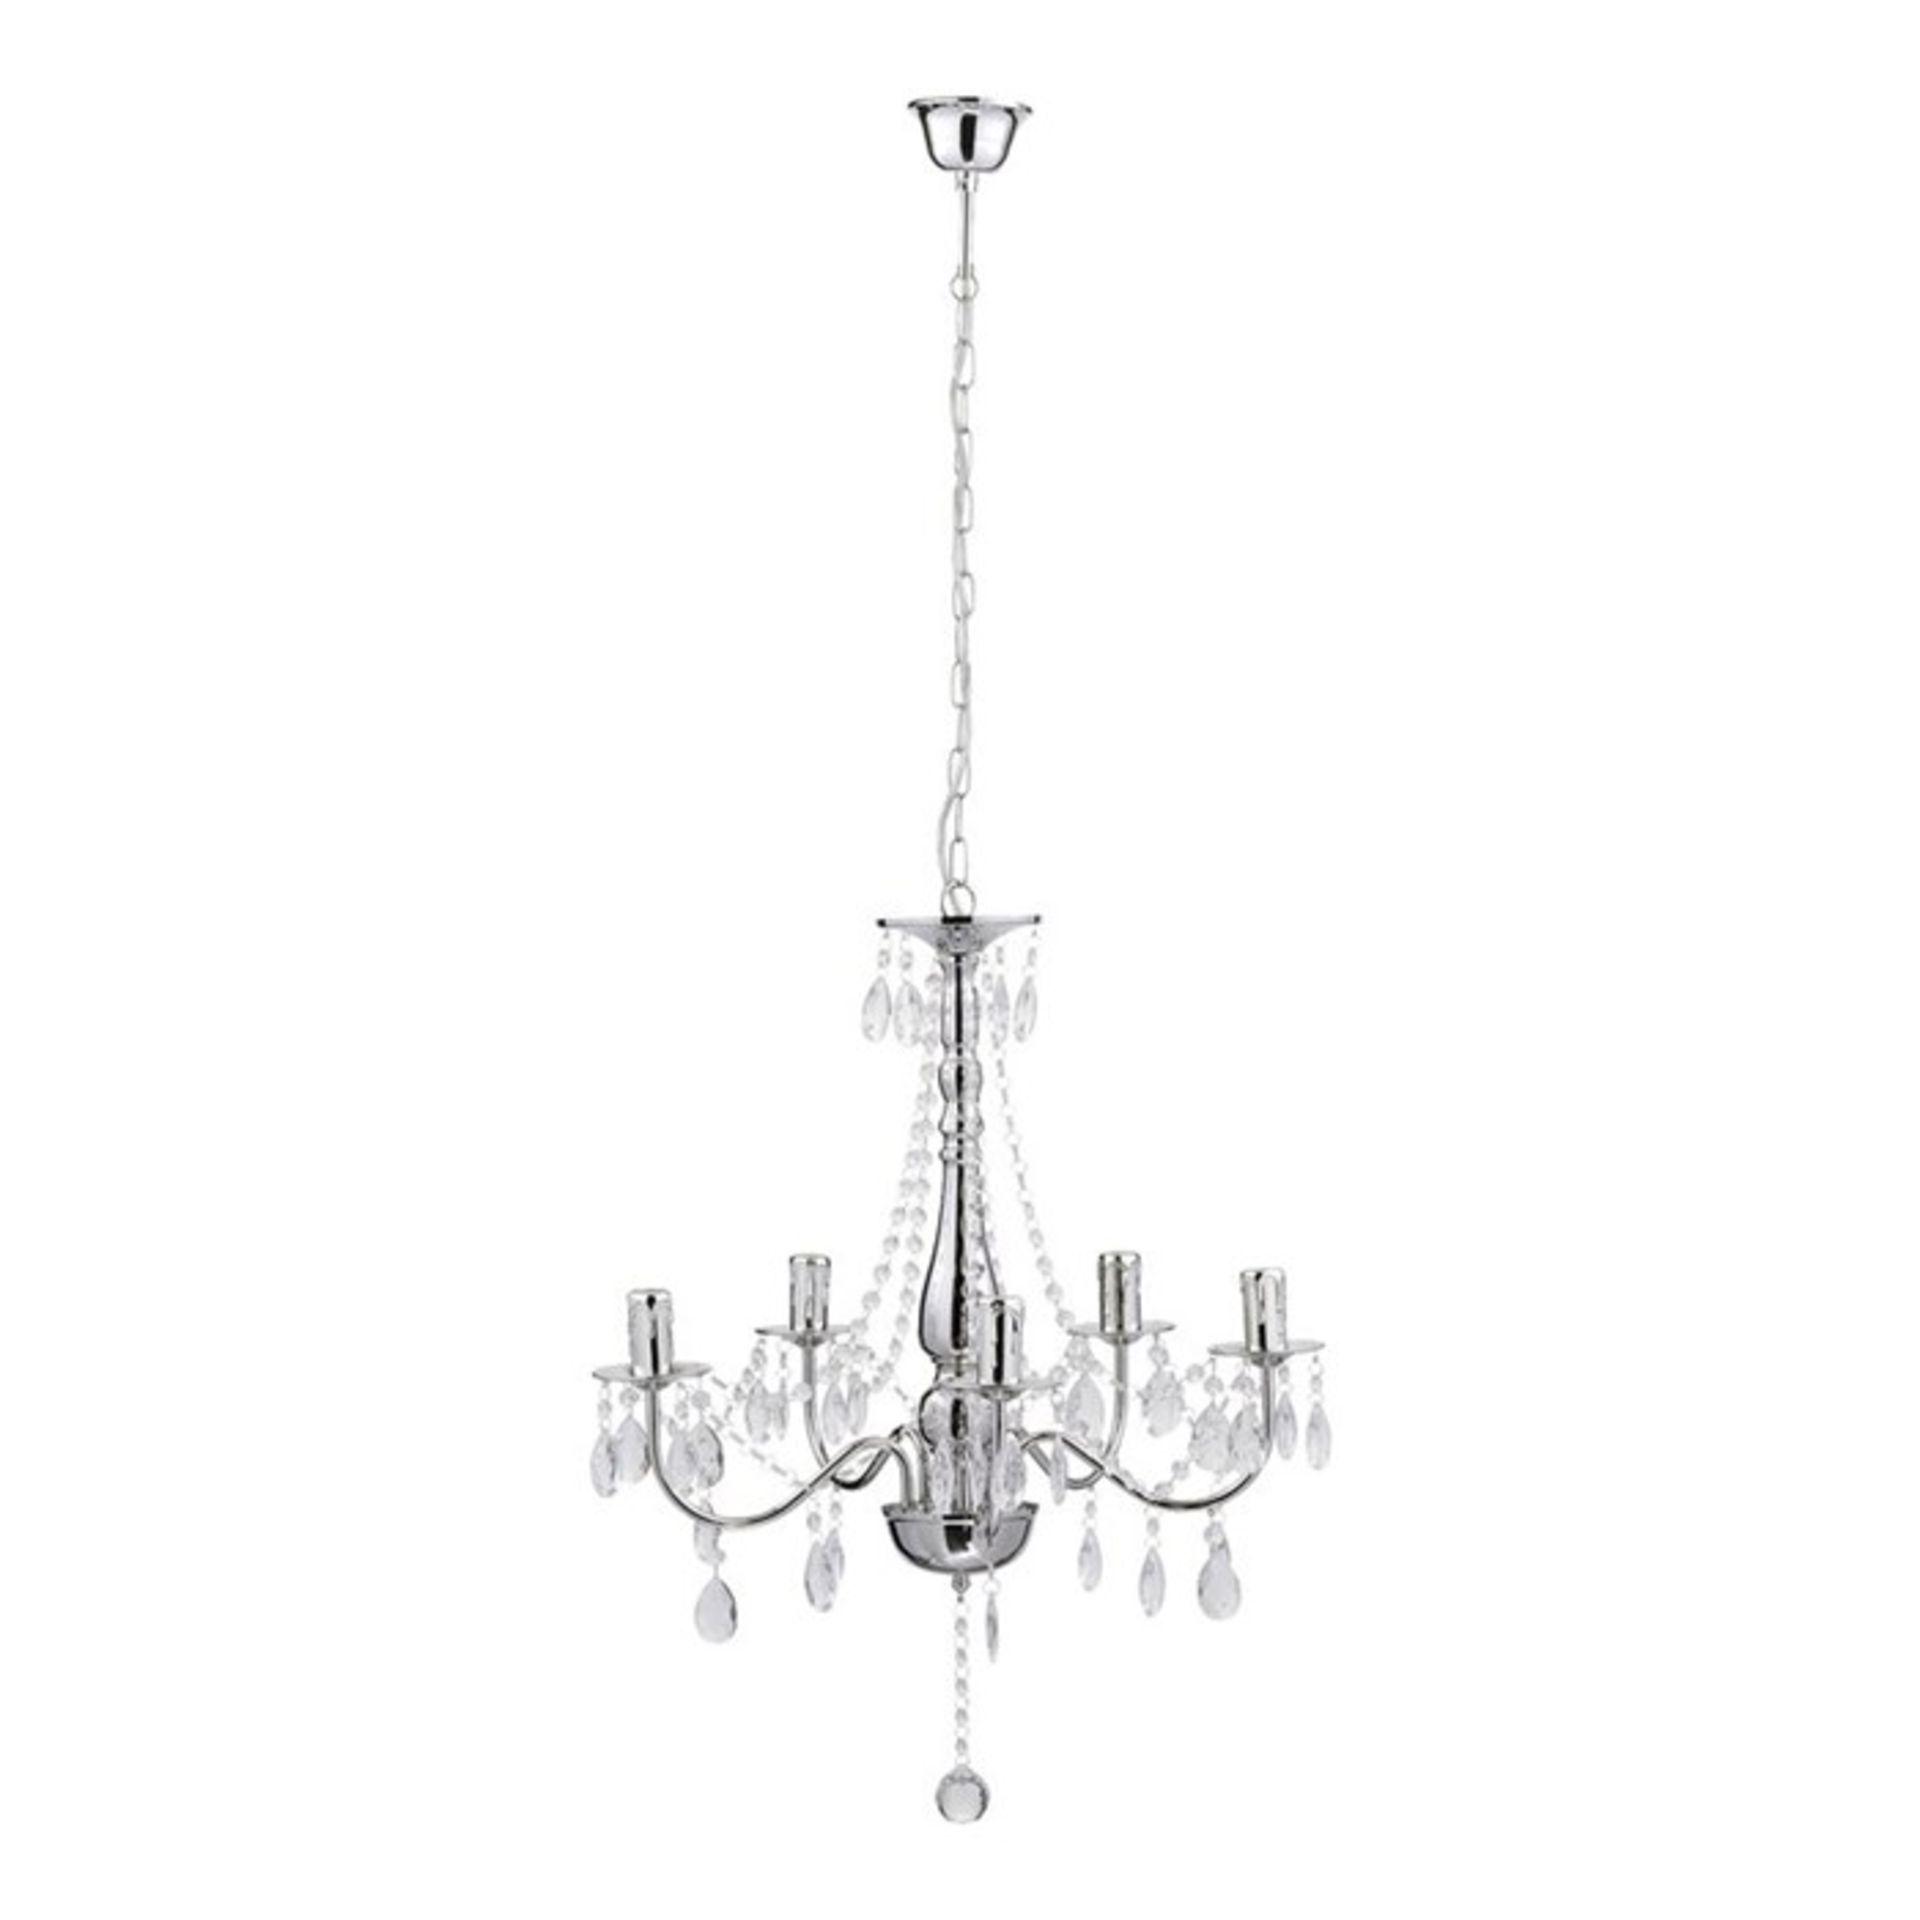 Lot 18 - Home Essence,William 5 Light Candle Chandelier - RRP £59.99 (QGL5610 - 15767/9) 7F